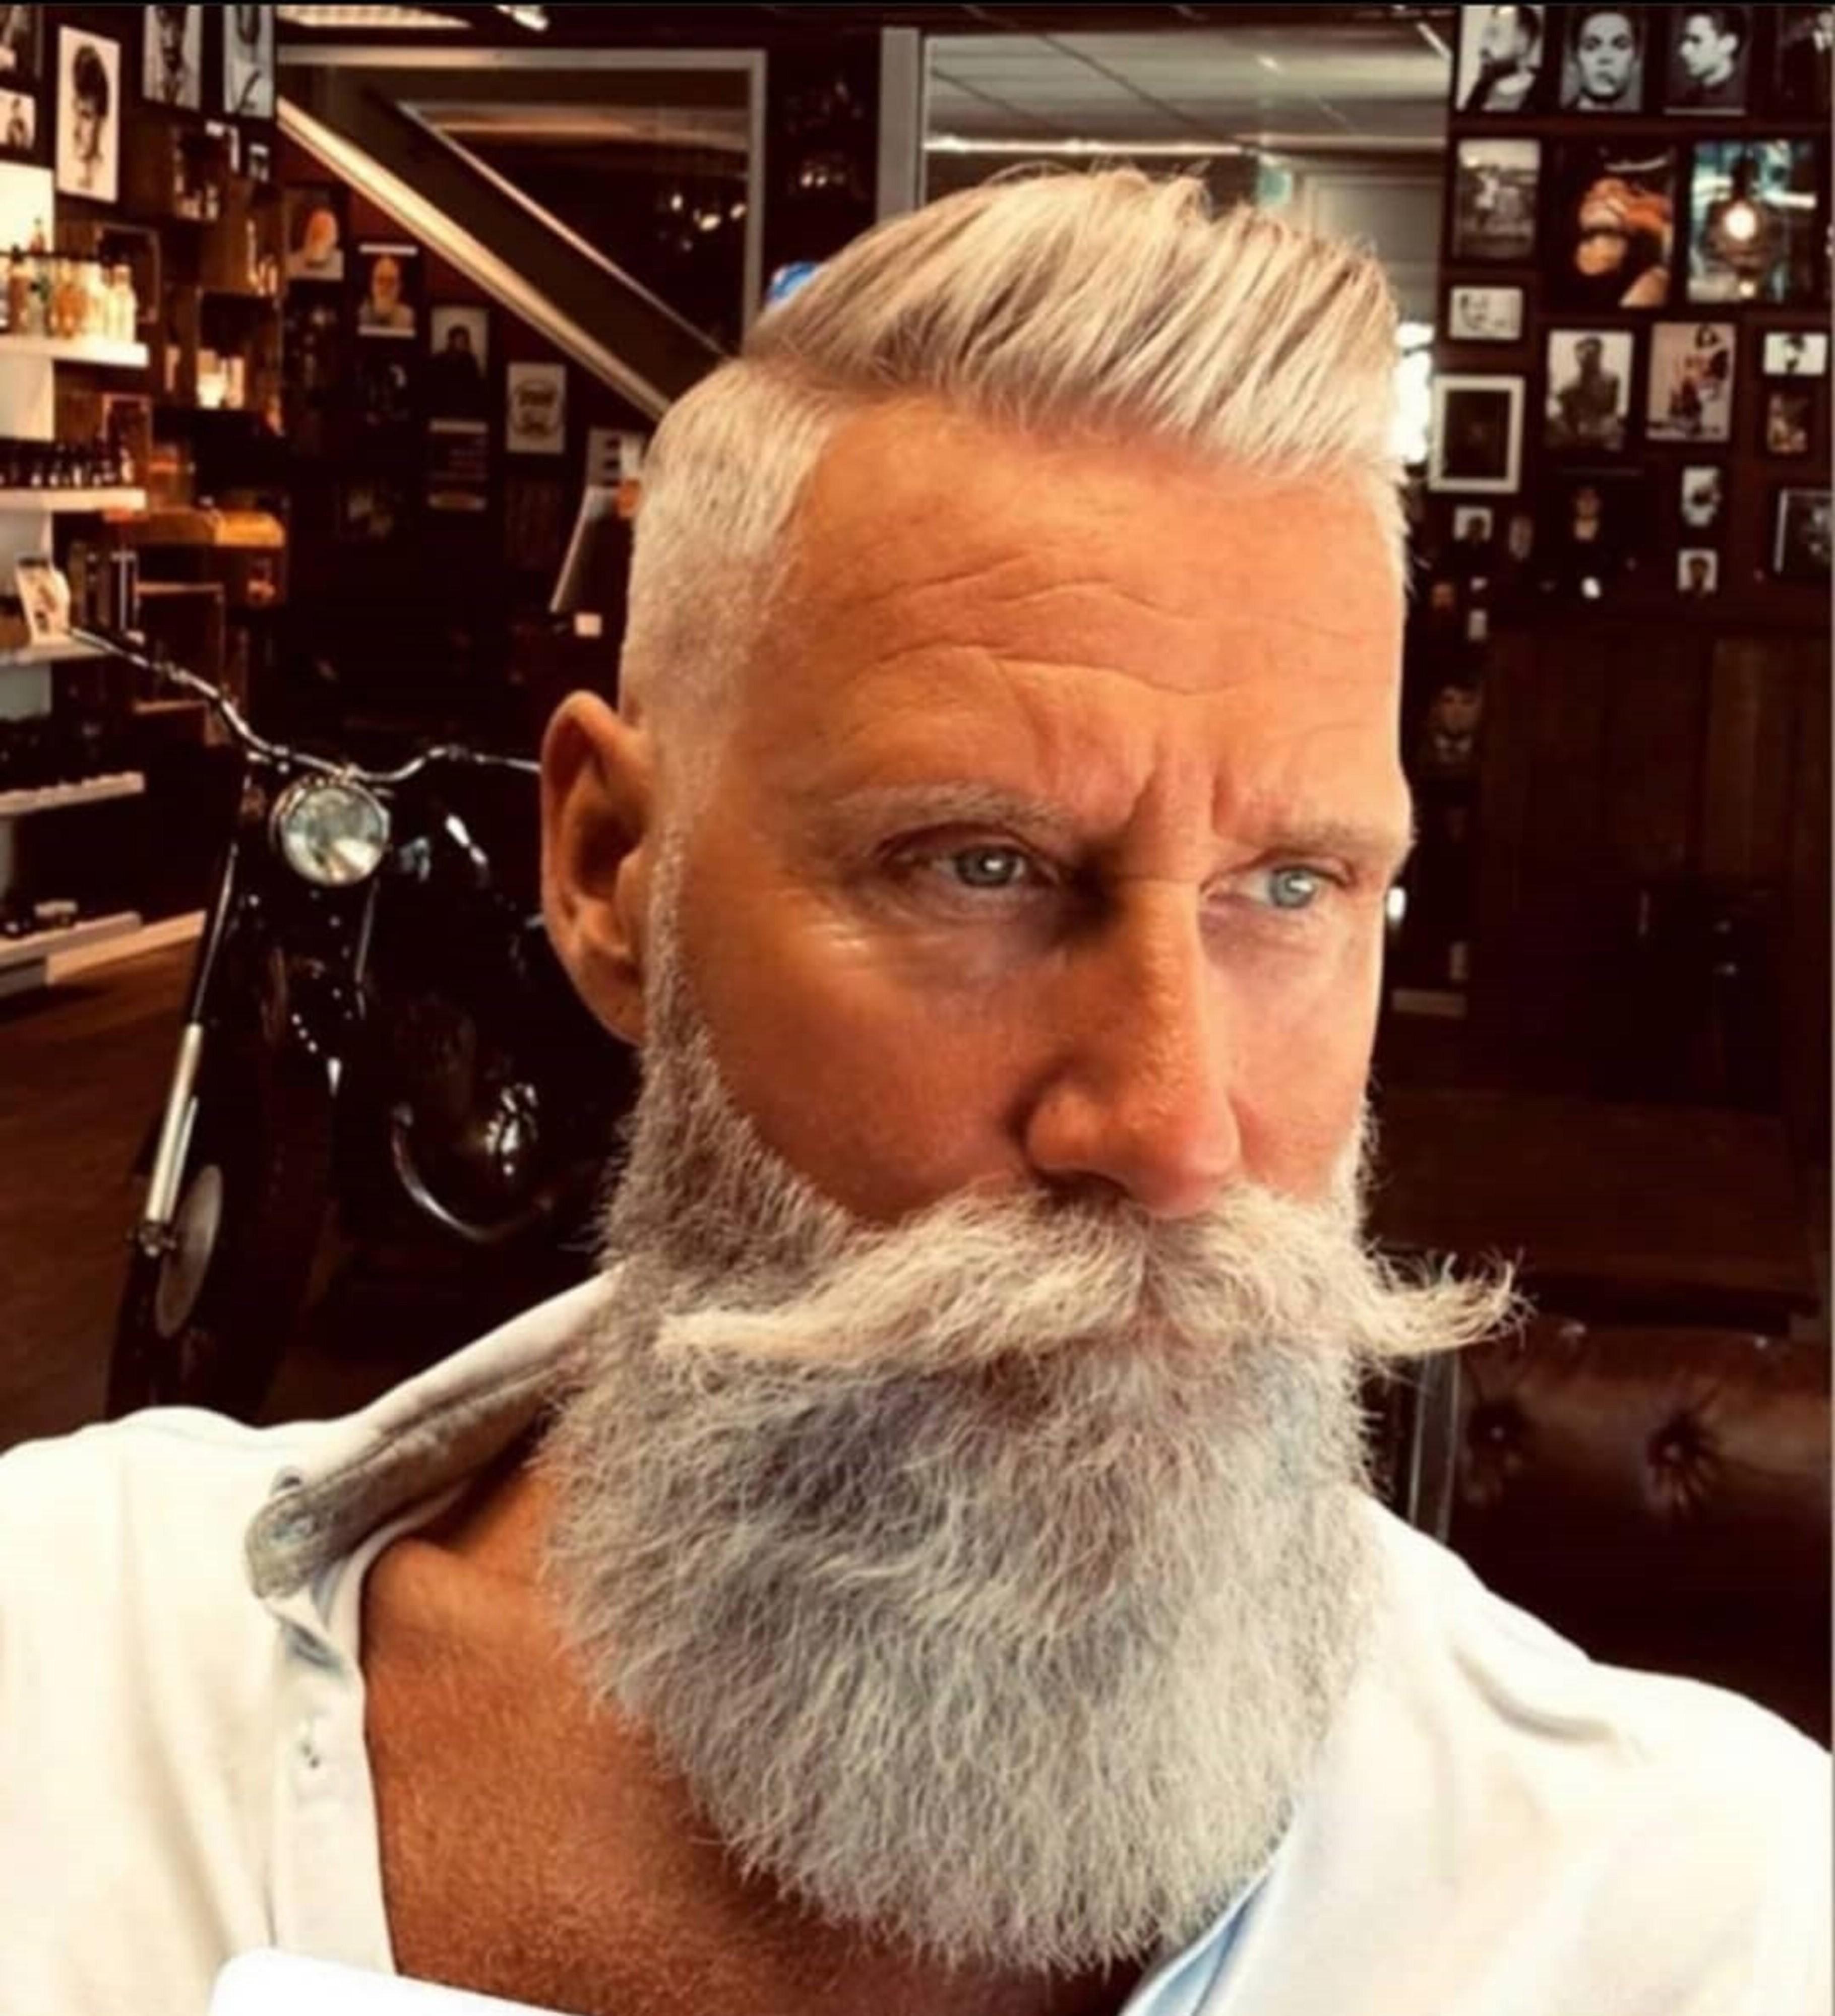 A long Verdi beard style for males.